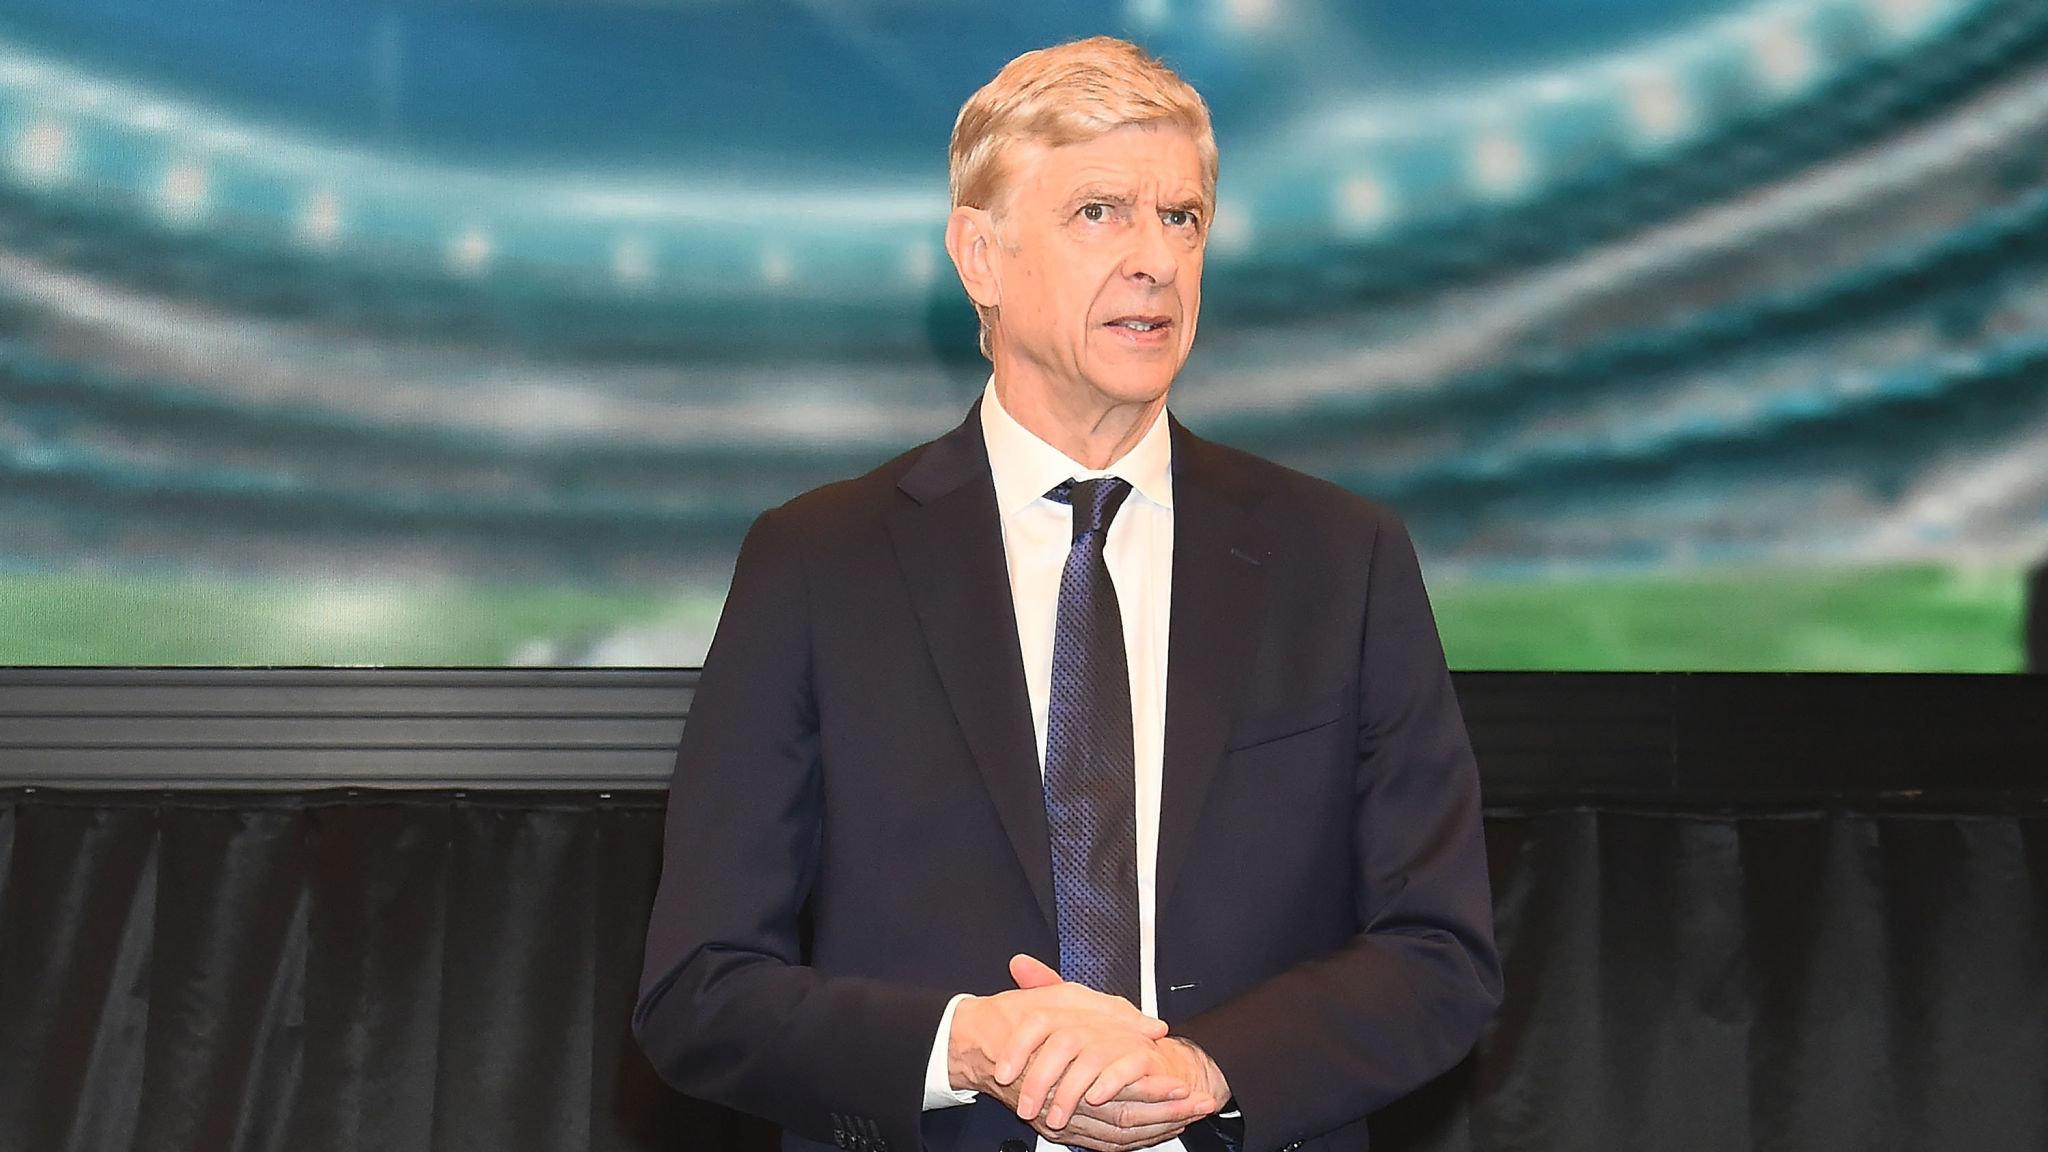 Former Arsenal Boss Arsene Wenger Takes Up Post At Fifa Financial Times